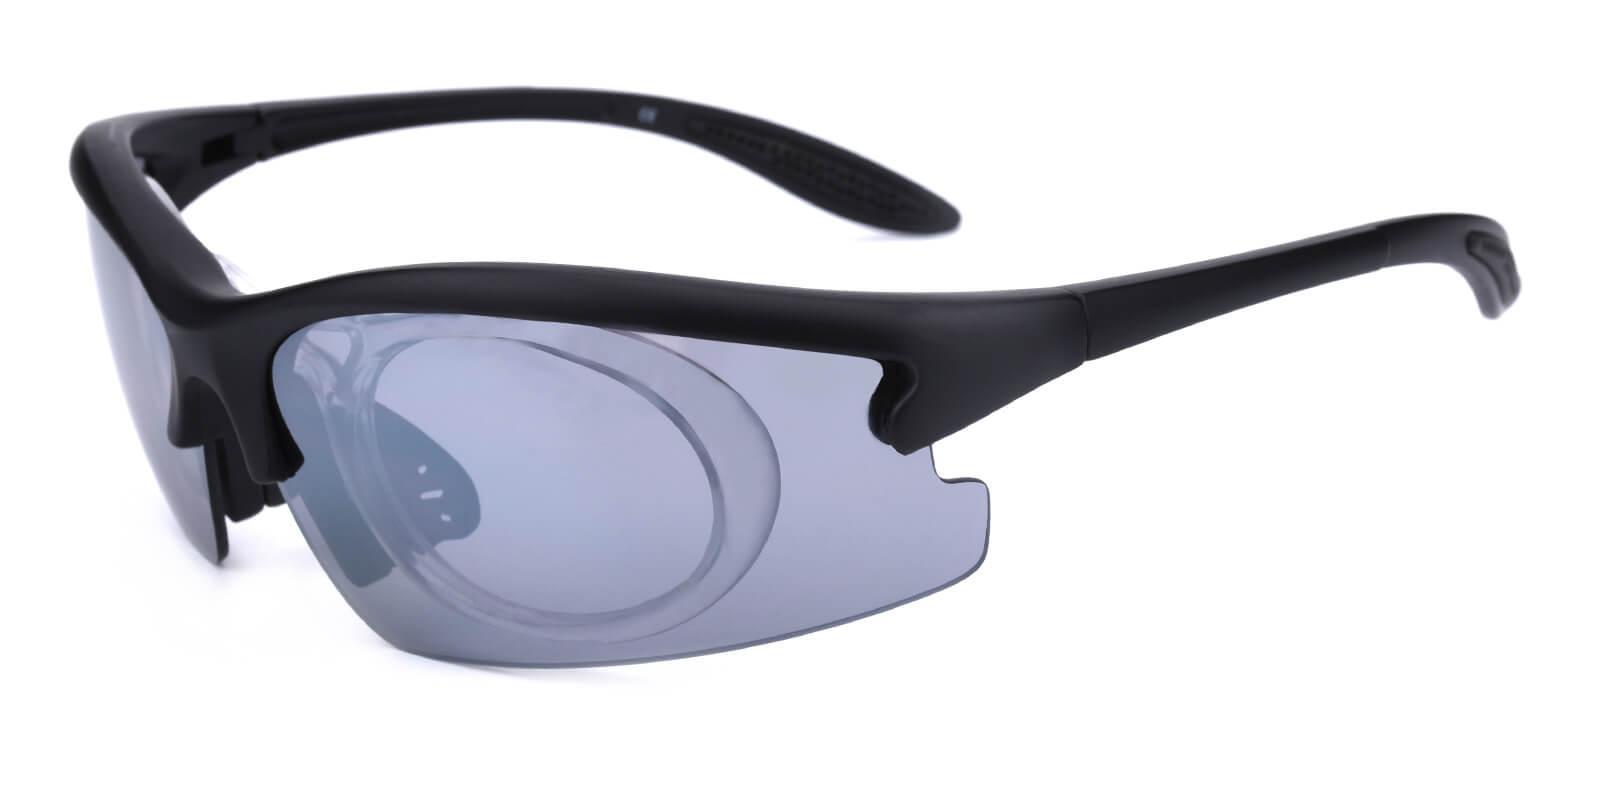 Windrise-Black-Square-Plastic-SportsGlasses-additional1